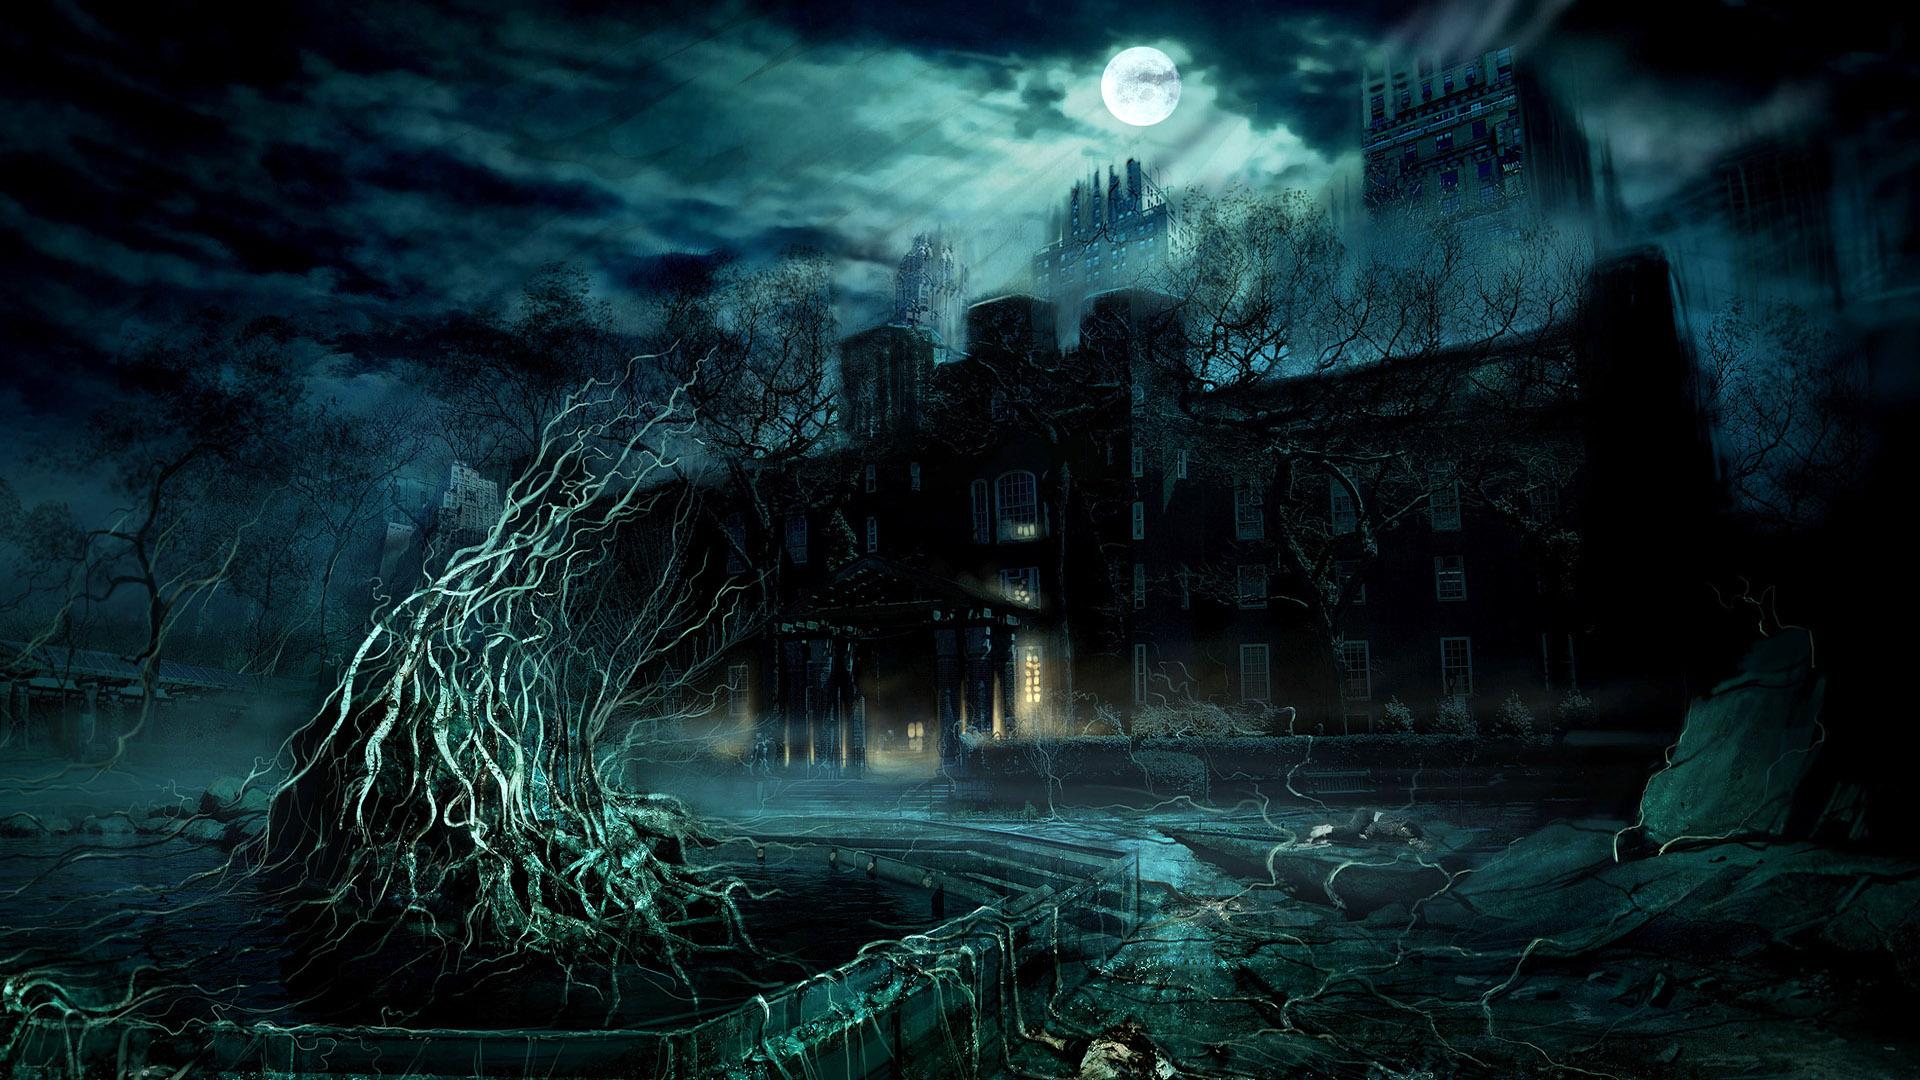 HD Wallpapers Dark Game Scene